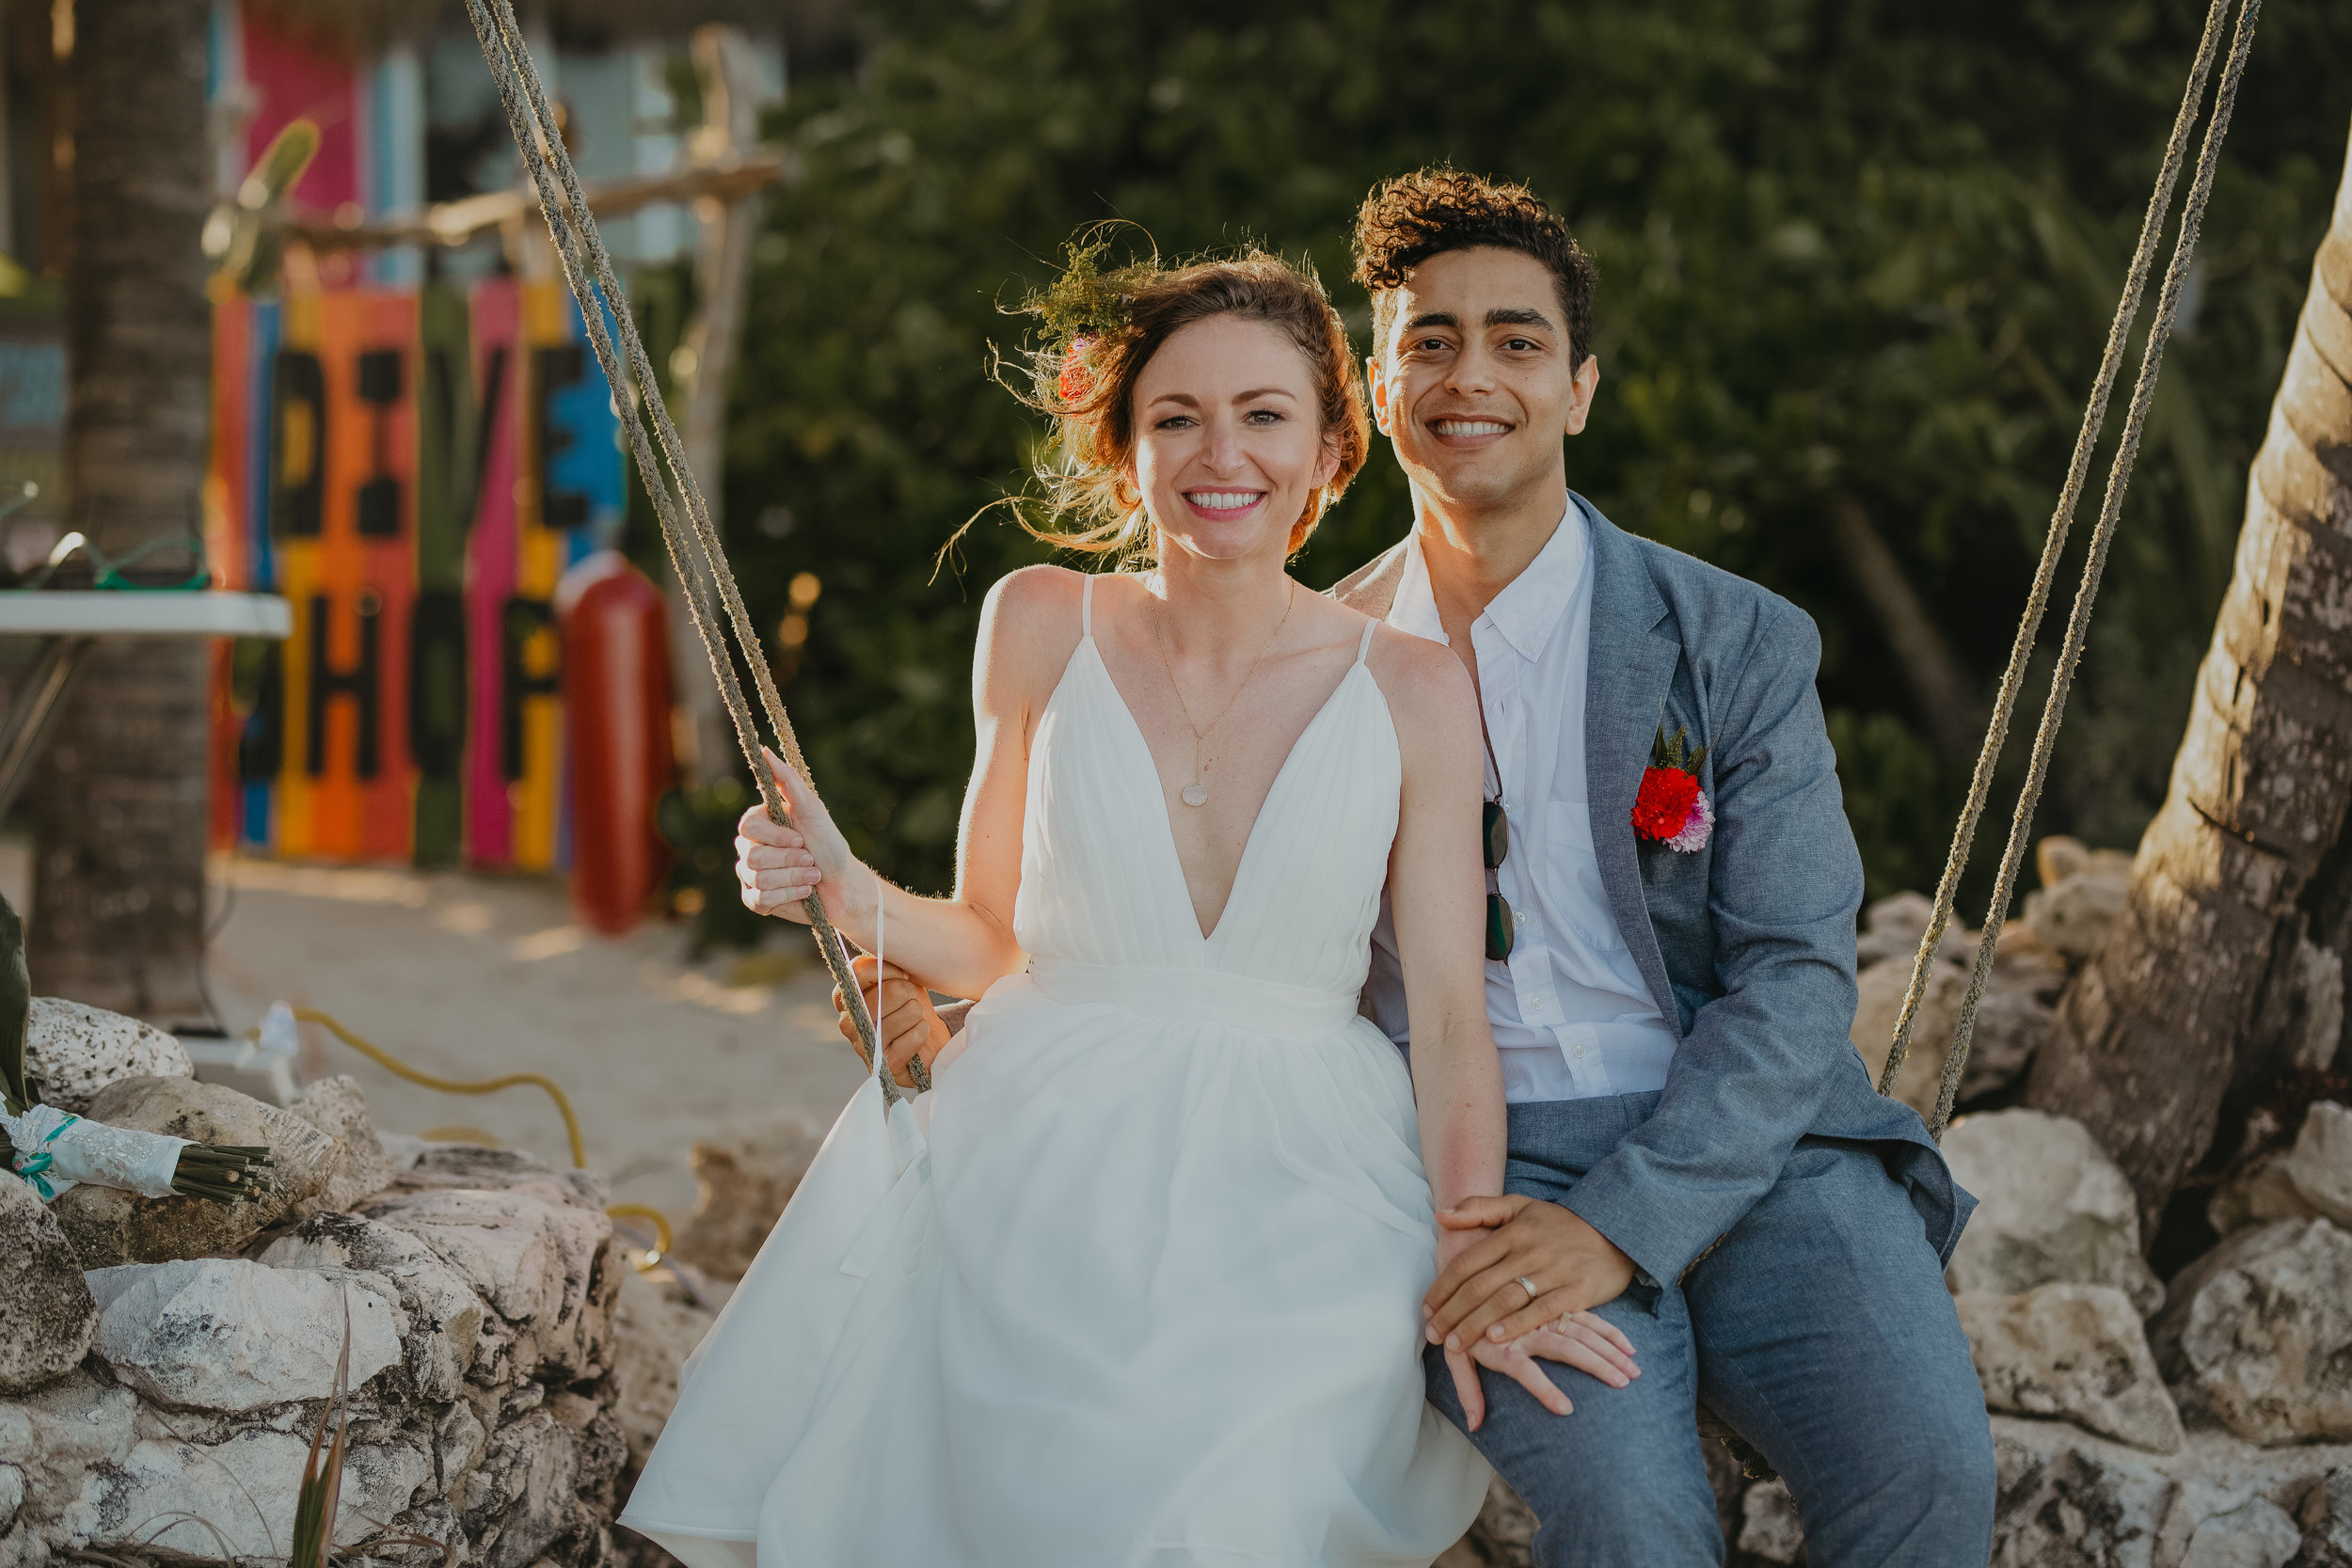 Nicole-Daacke-Photography-beachfront-akumal-destionation-wedding-tulum-mexico-elopement-photographer-destination-wedding-inspiration-sunset-champagne-pop-boho-bride-ocean-tropical-bohemian-tulum-wedding-photos-175.jpg